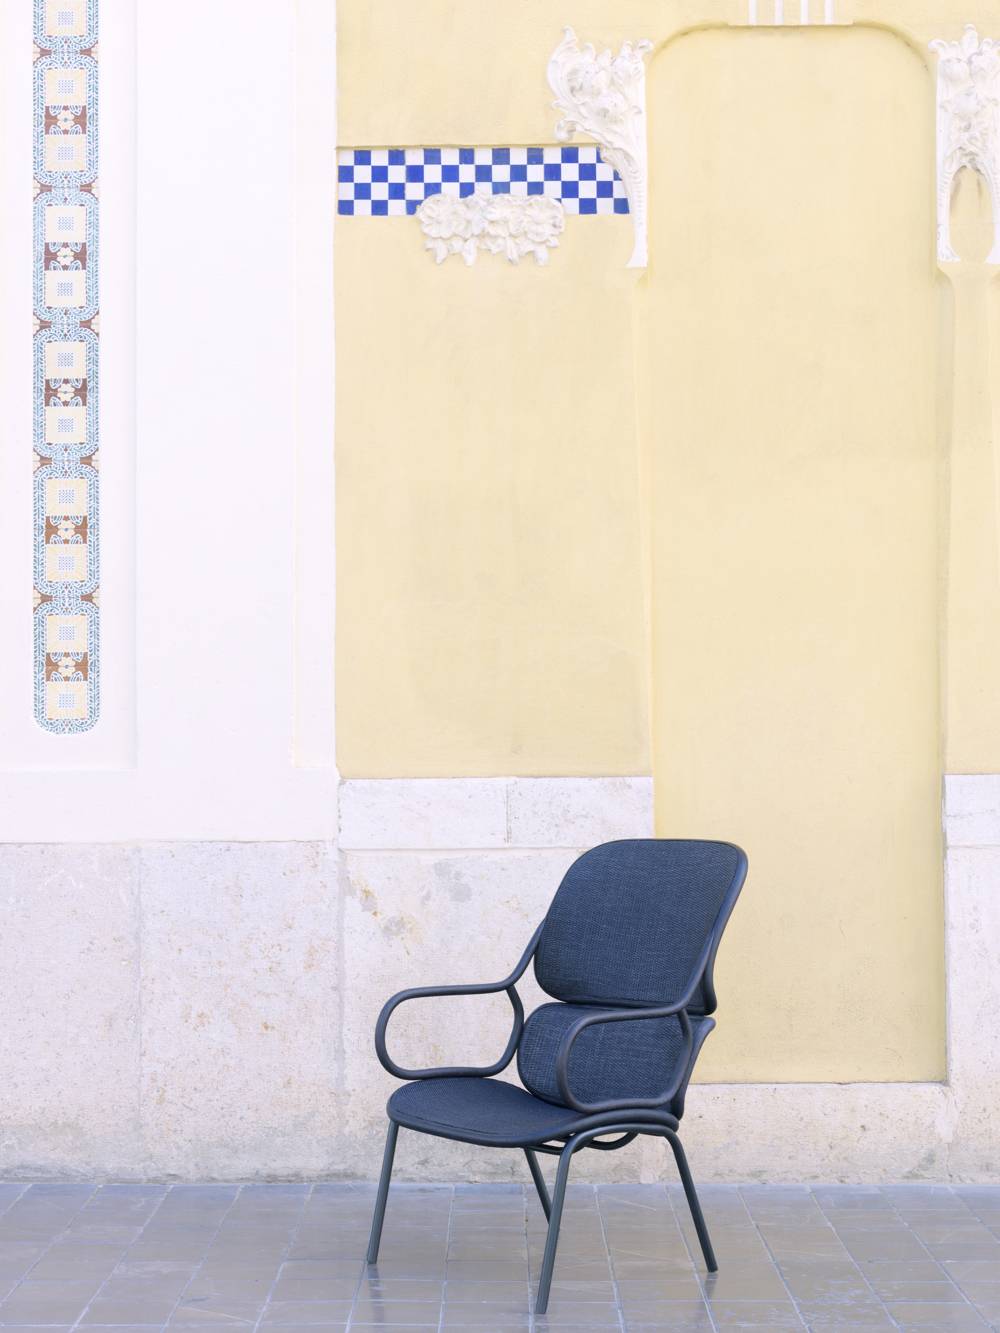 Expormim Frames chair